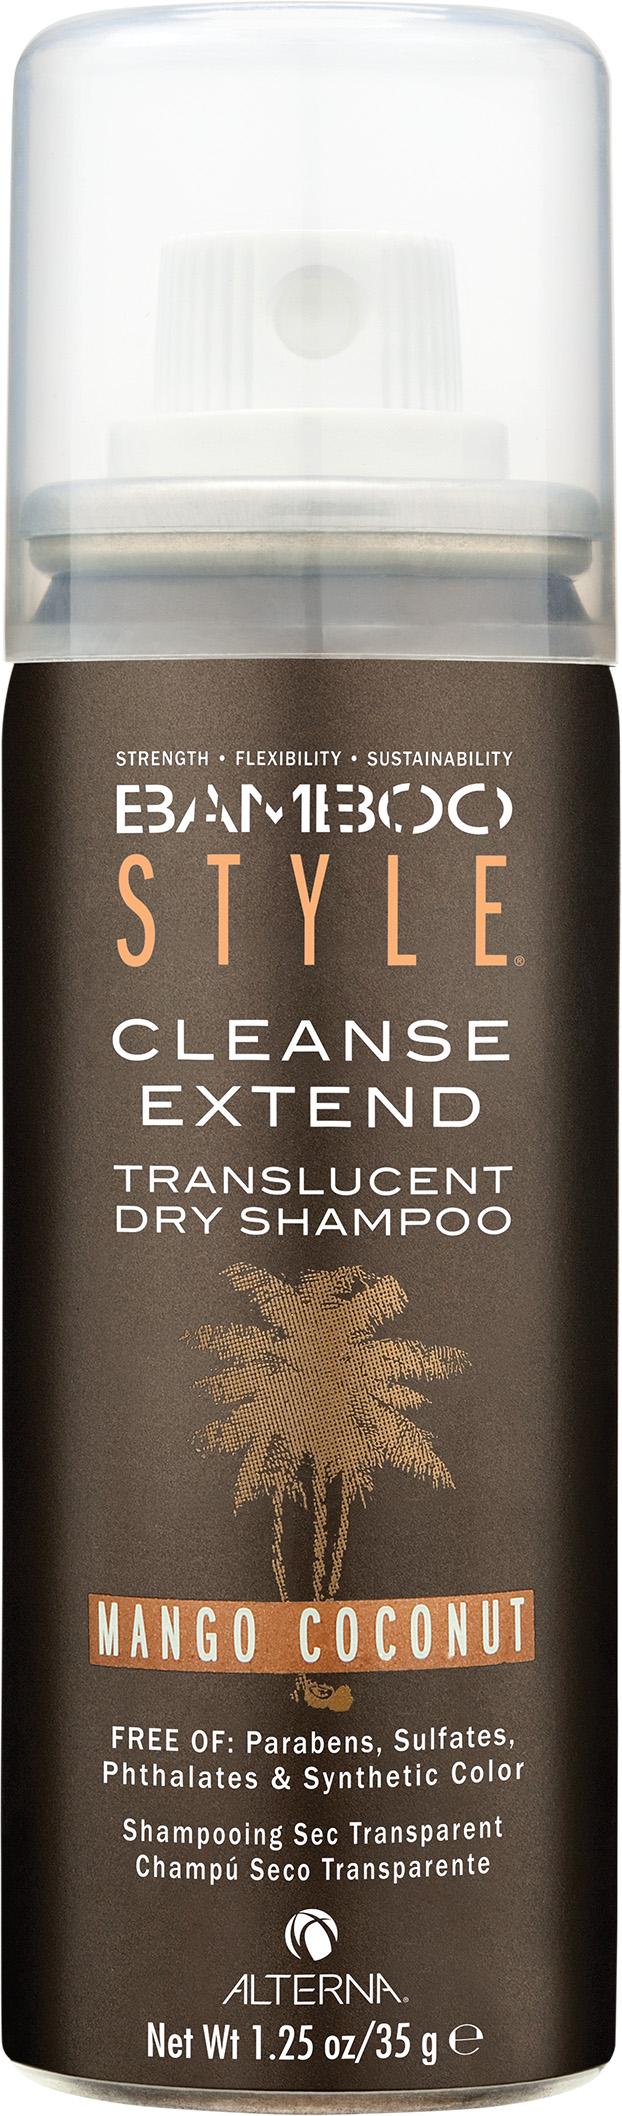 ALTERNA Спрей-шампунь сухой для свежести и объема с ароматом манго и кокоса / Style Cleanse Extend Translucent Dry Shampoo Mango Coconut BAMBOO 40 мл